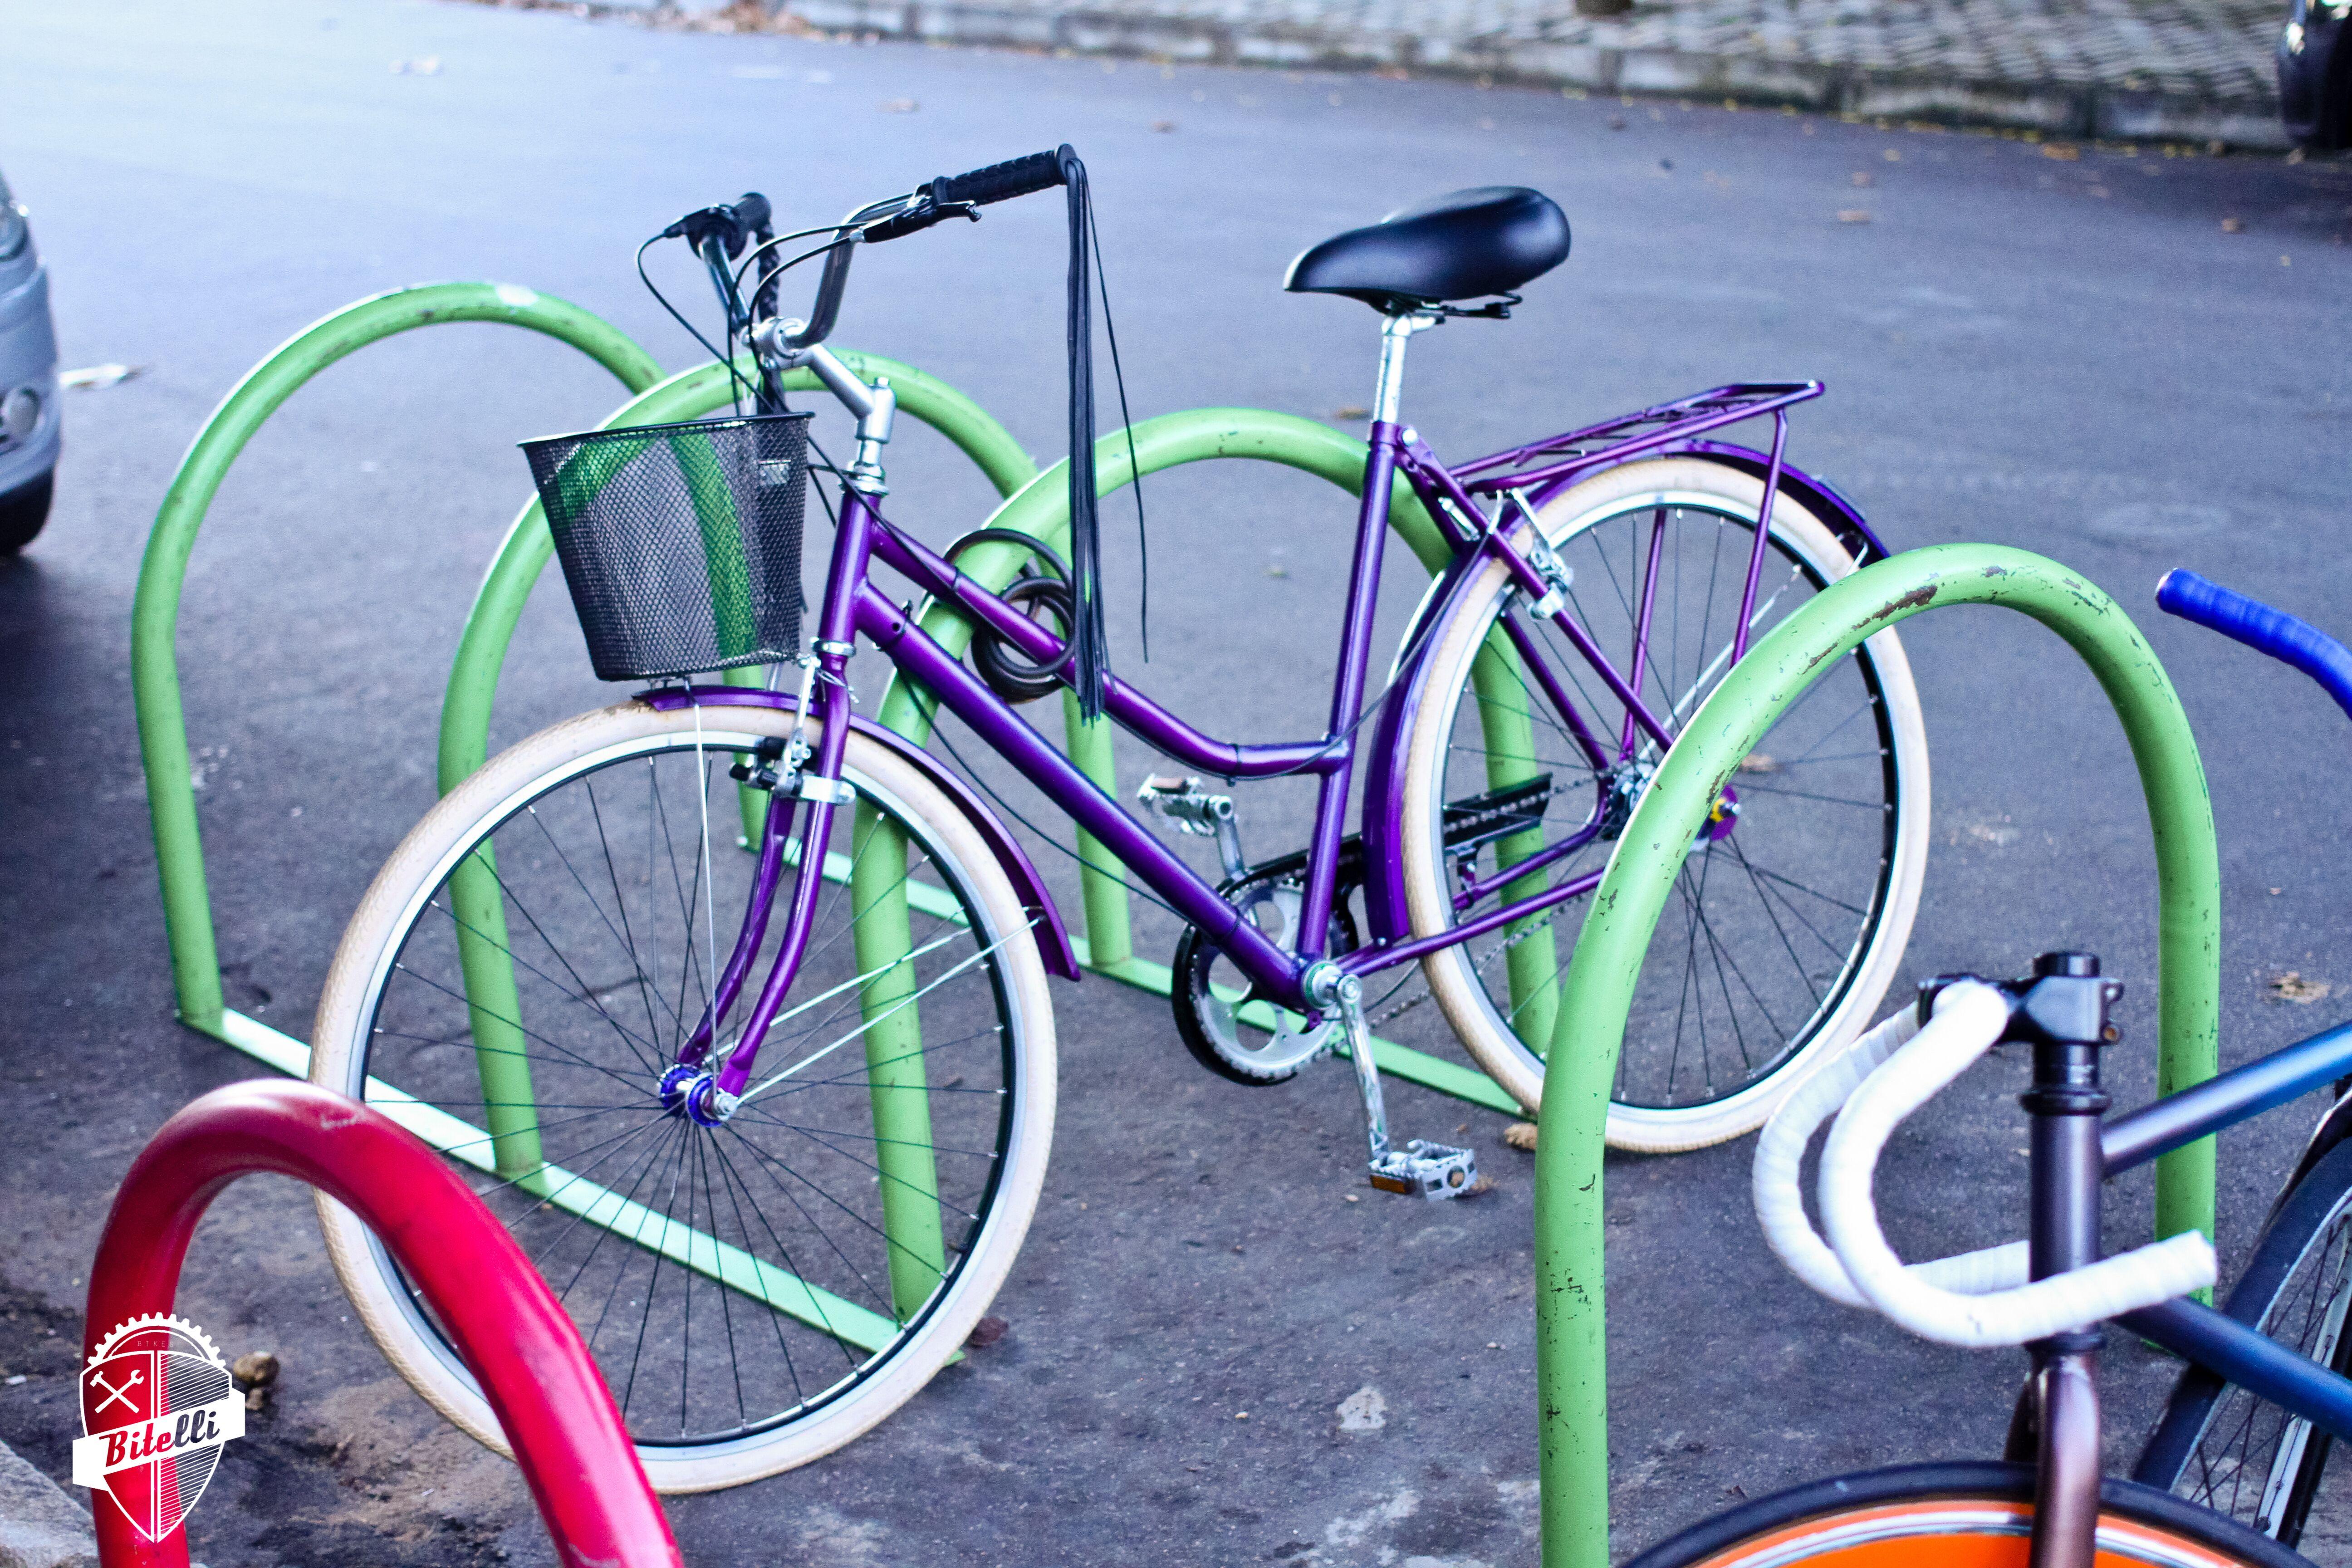 Bicicleta Urbana Bitelli Bikes Fortaleza blog De Bike na Cidade Sheryda  Lopes by Ricardo (5) 17ff3b8b90